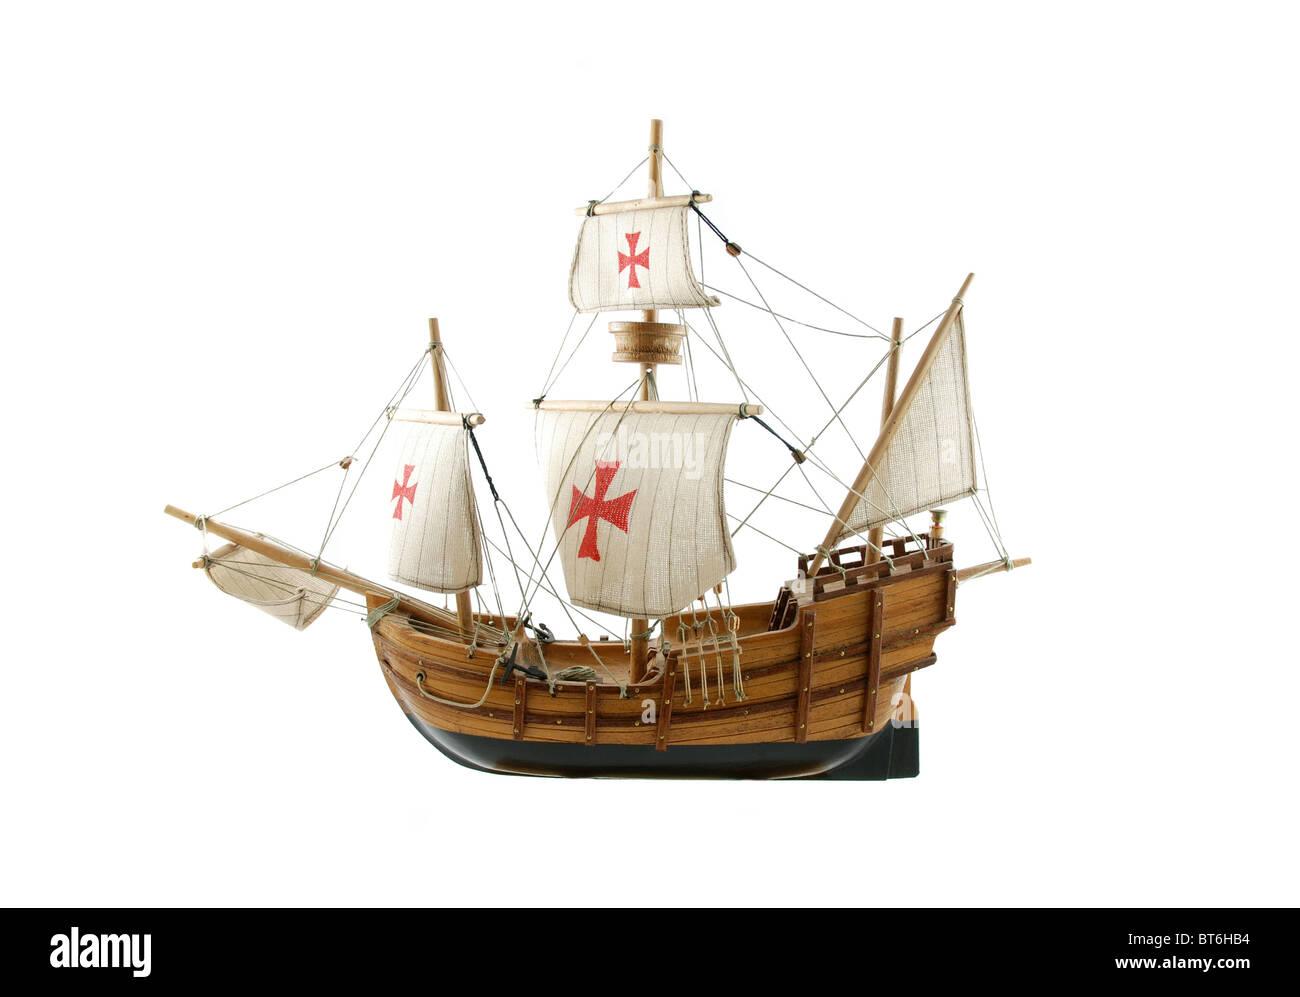 Wooden ship 'santa maria' isolated on white background - Stock Image